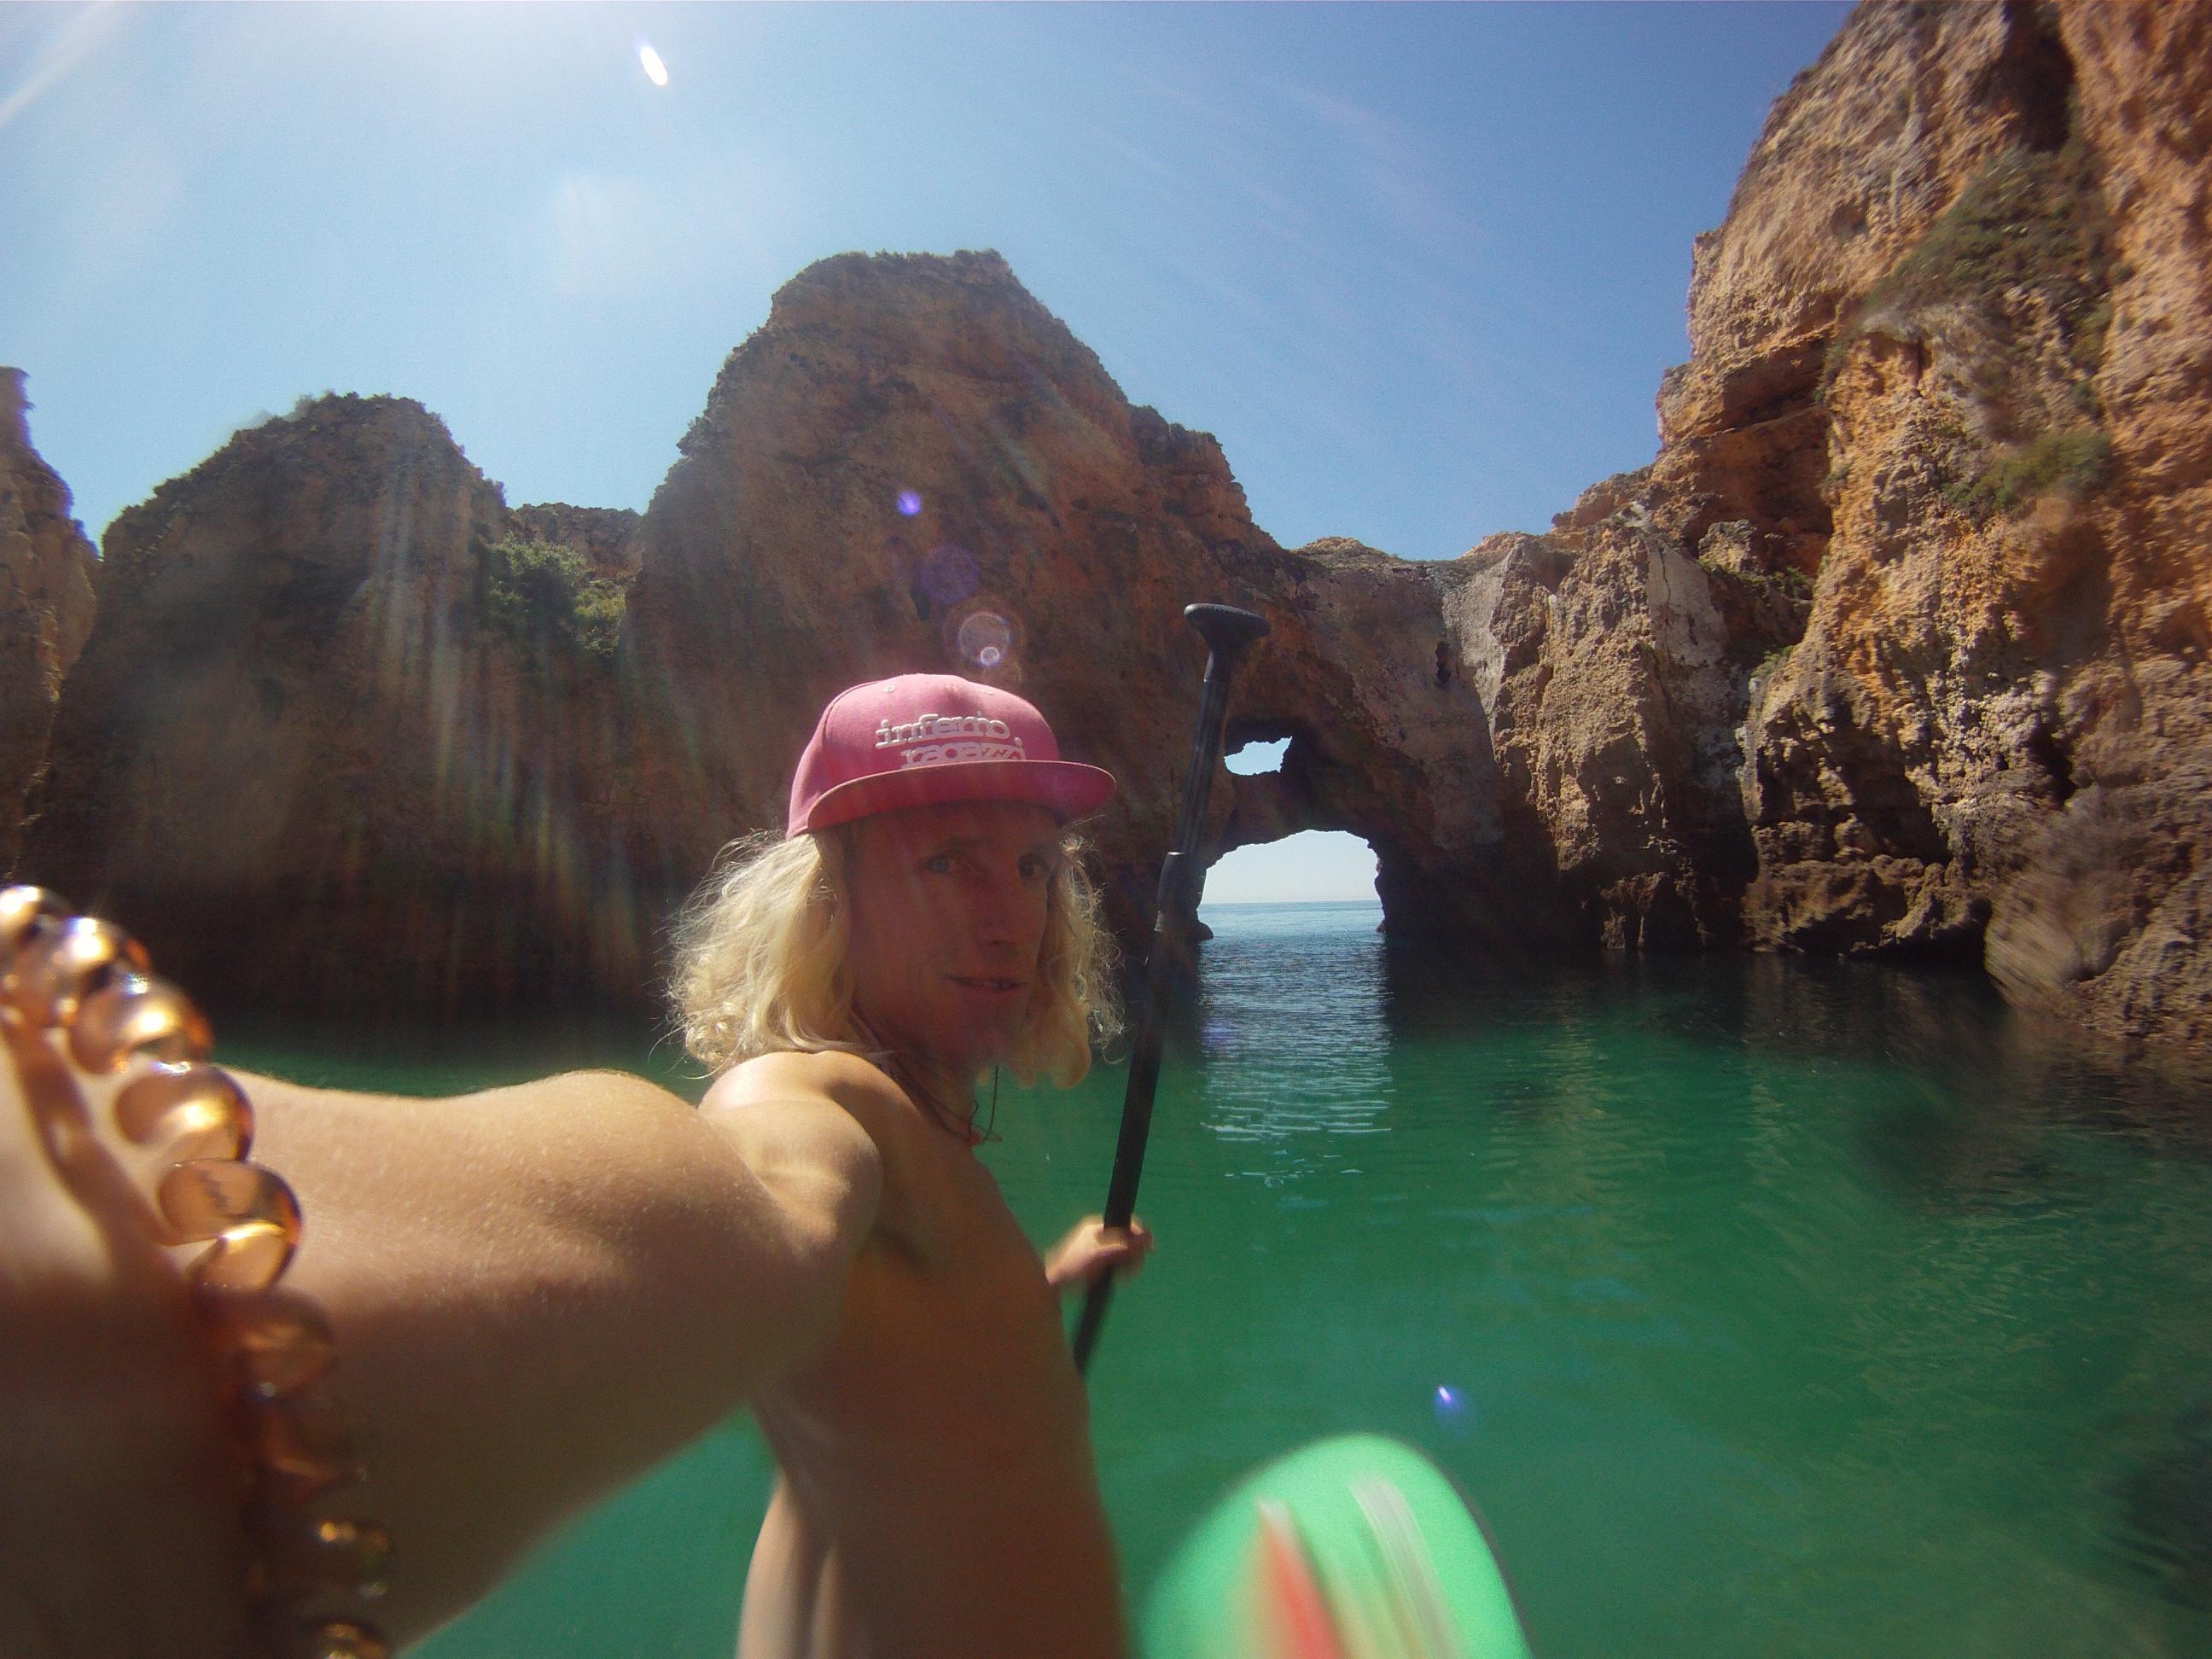 Surfguide Sup adventure